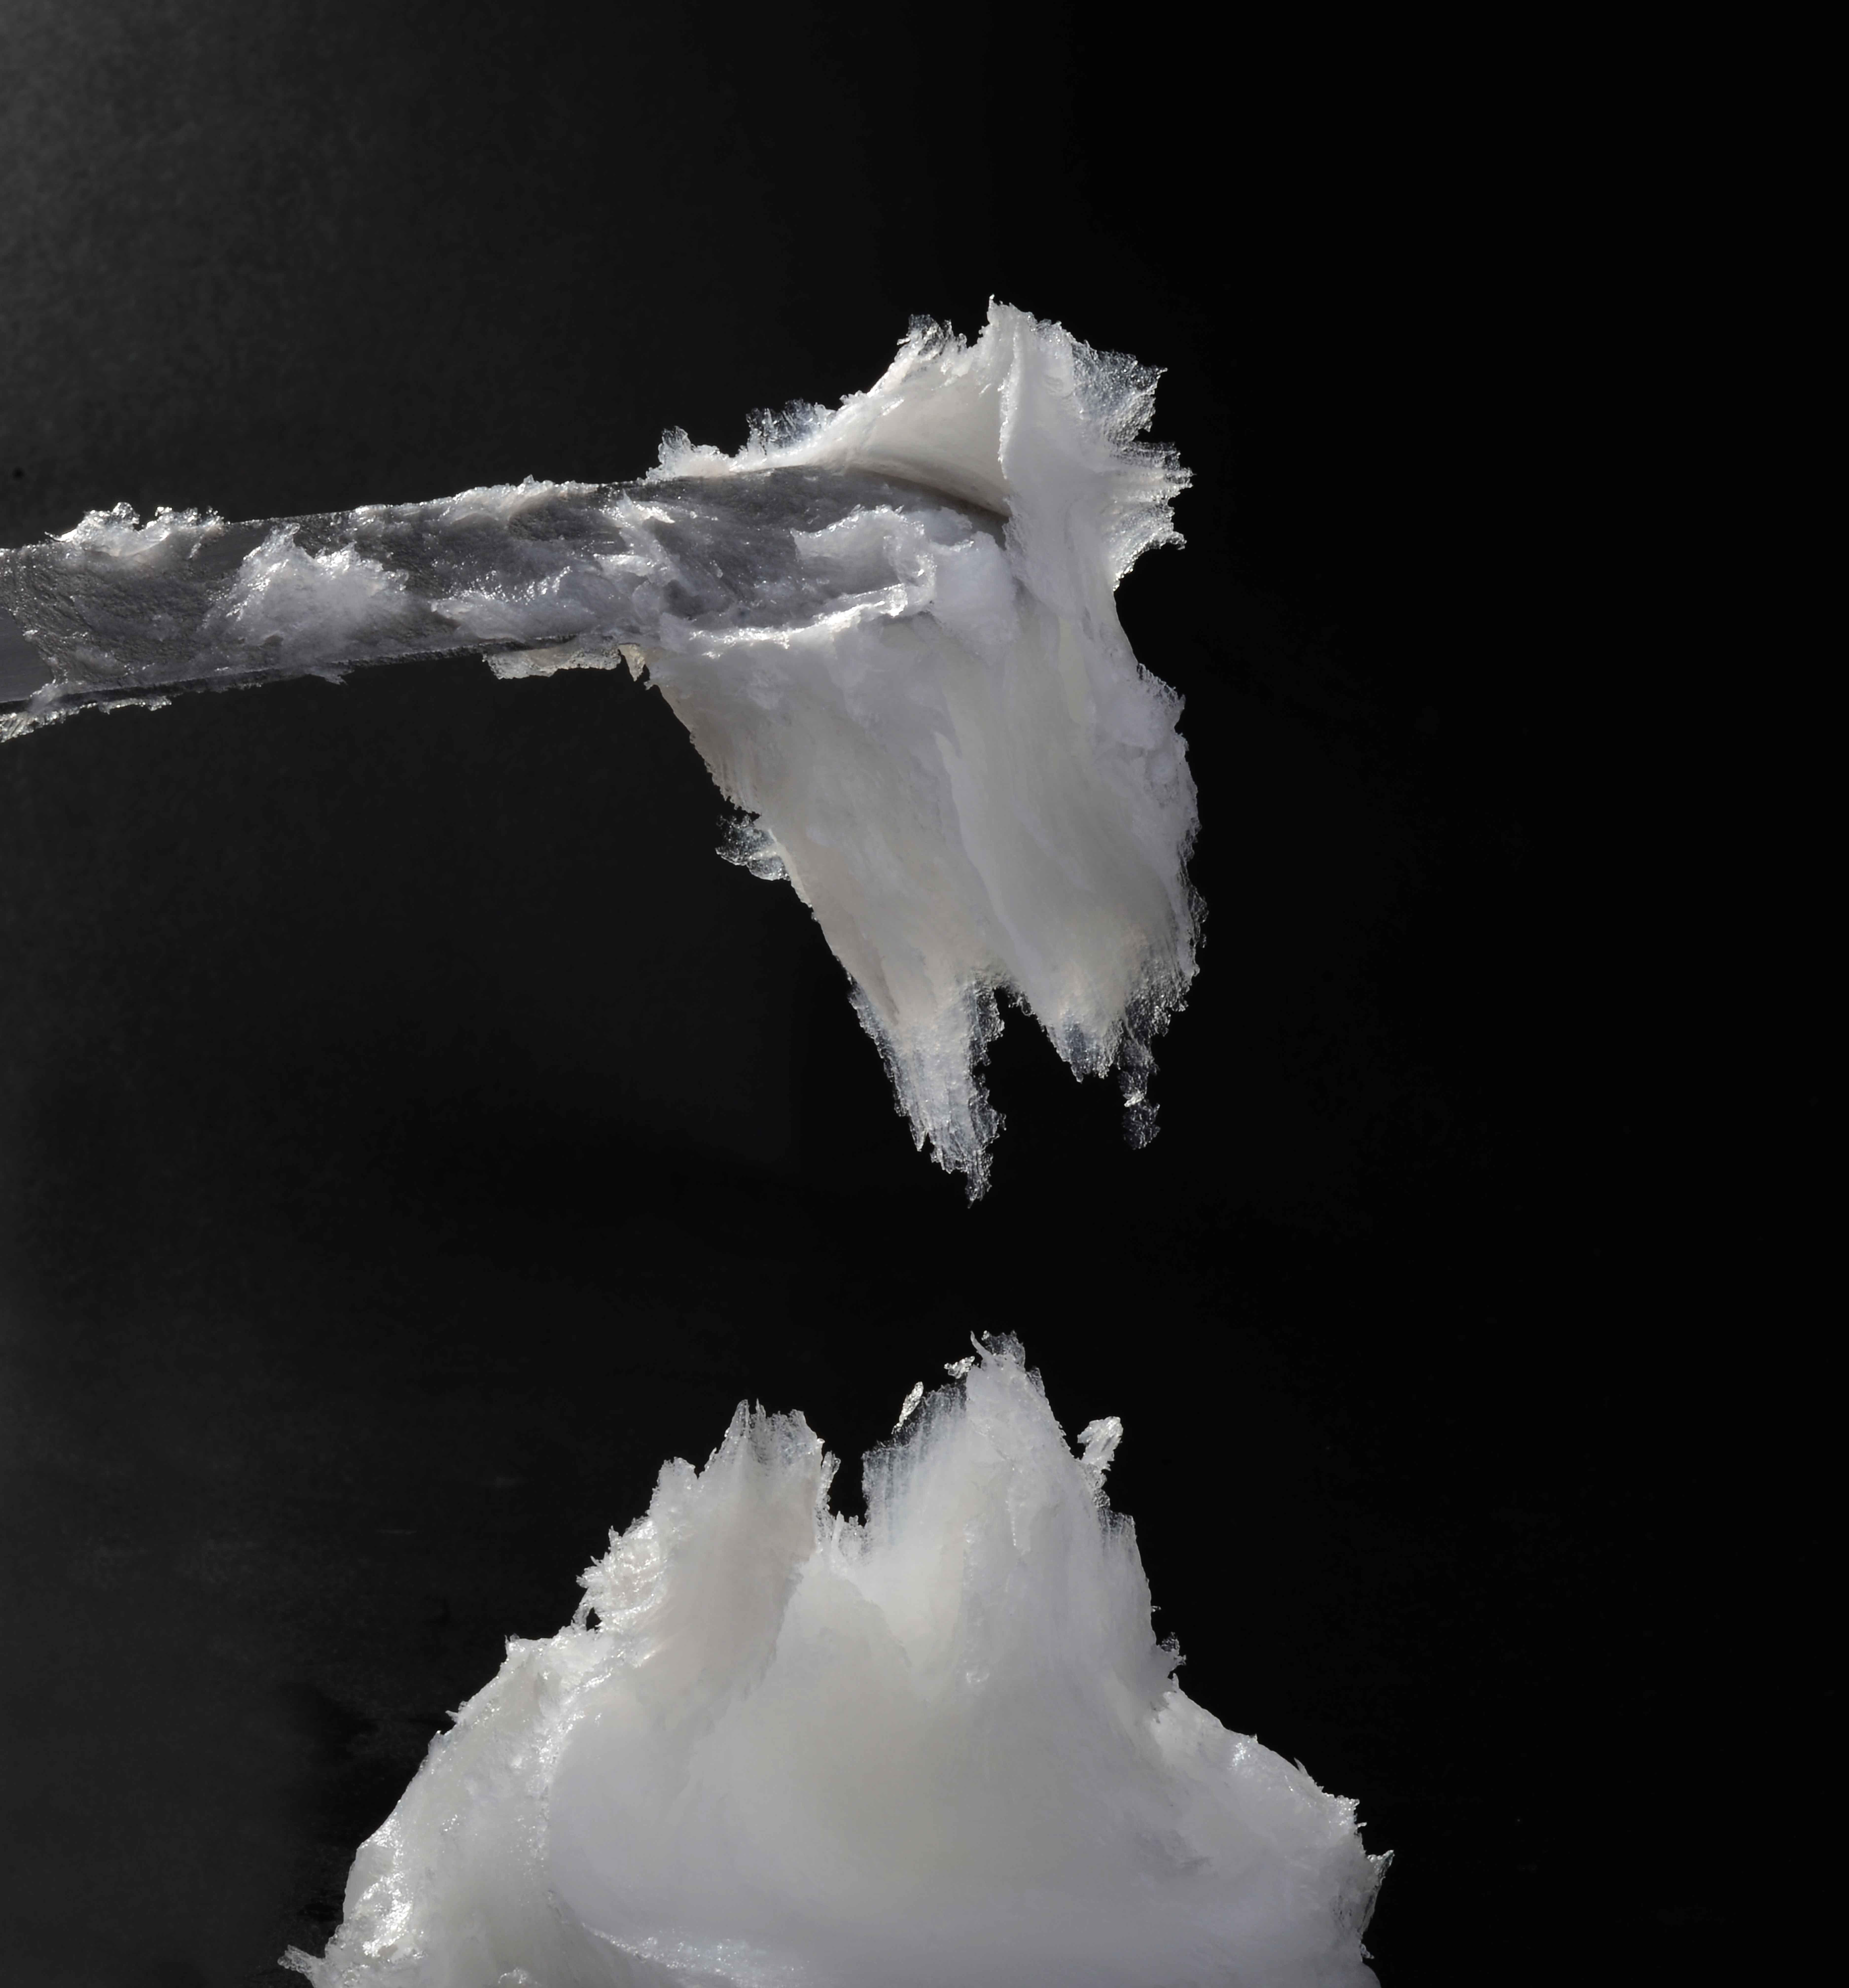 Superwhite Petroleum Jelly